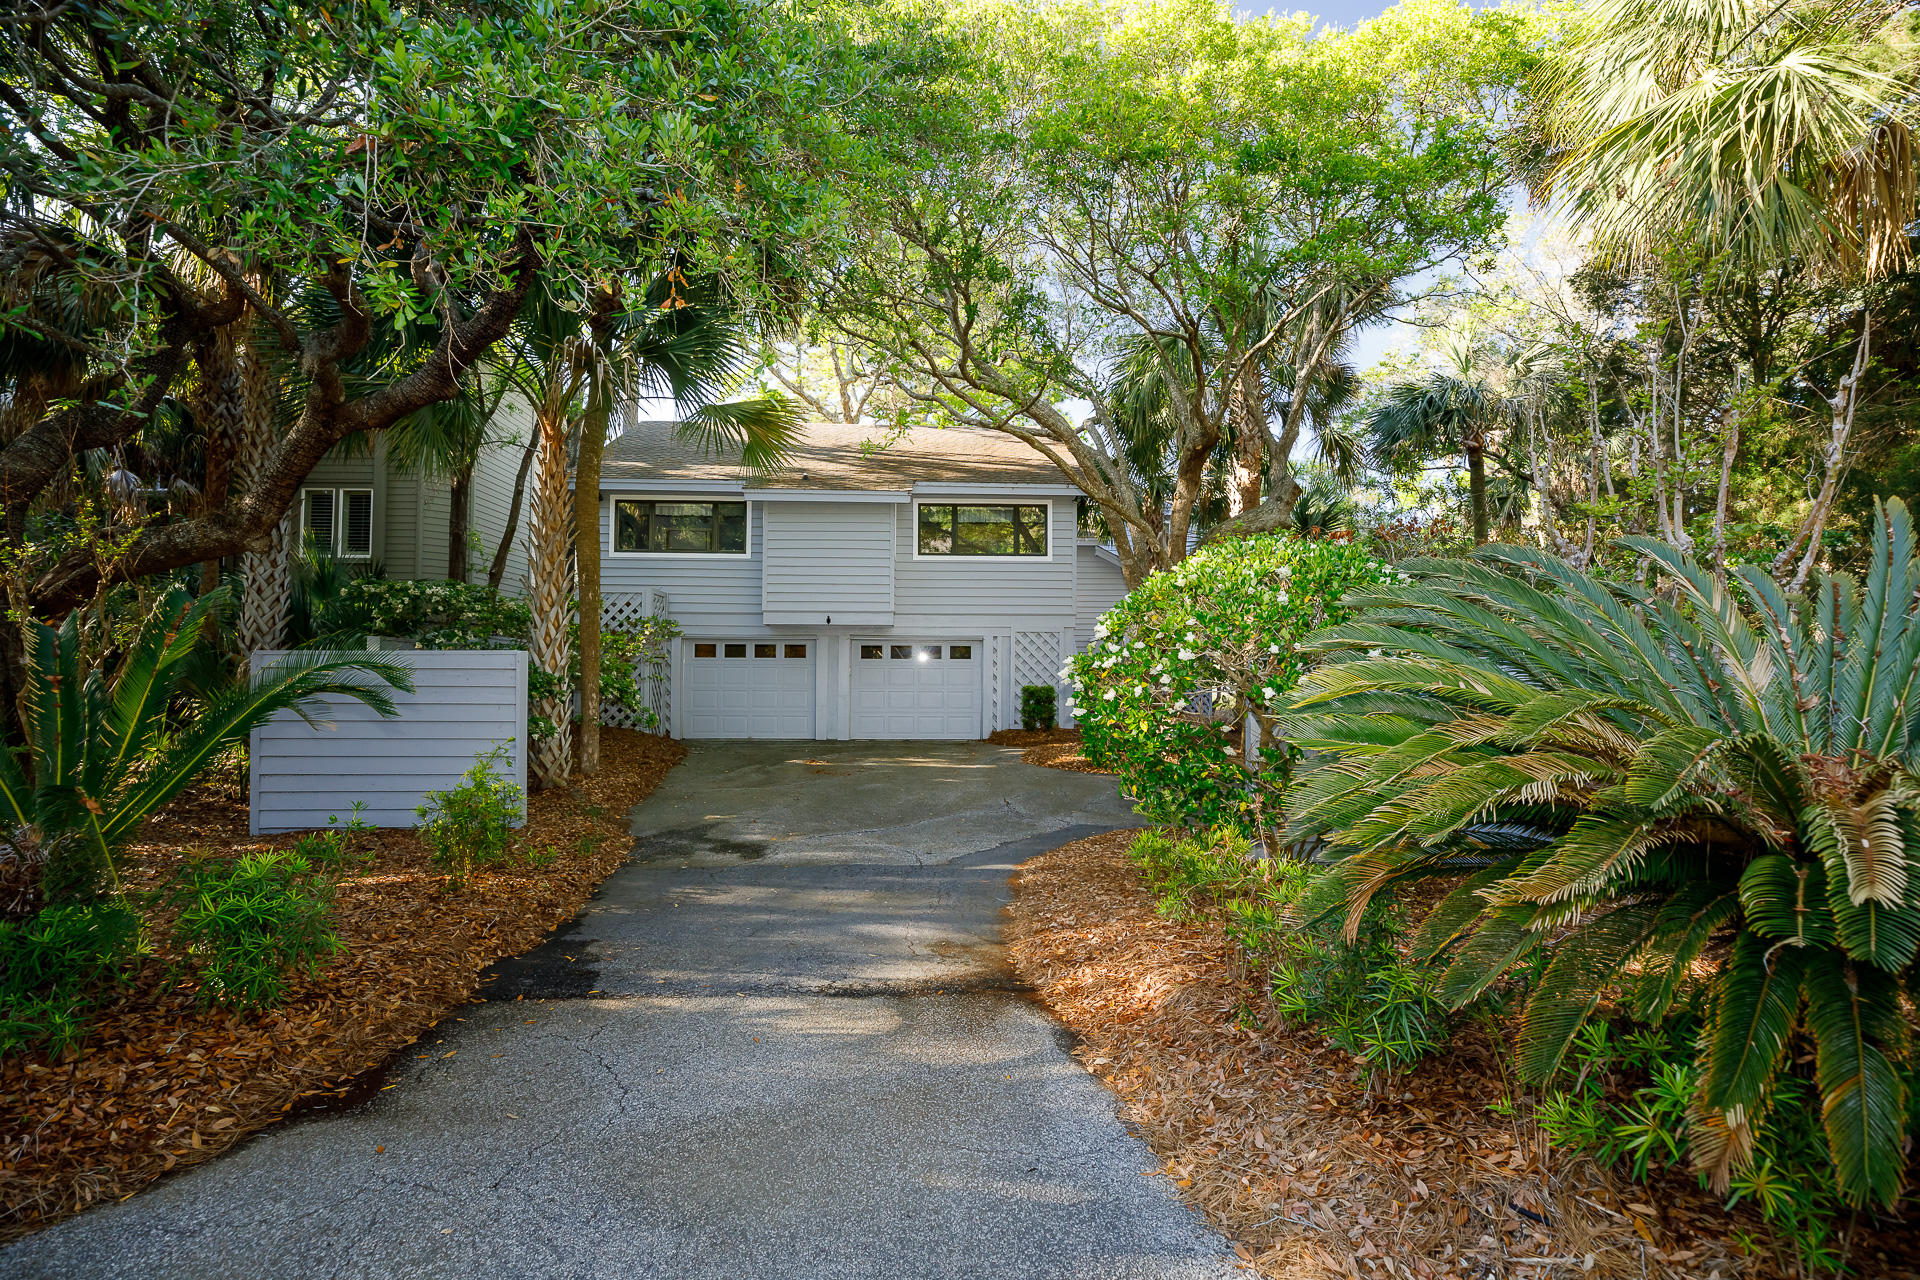 Kiawah Island Homes For Sale - 165 Marsh Hawk, Kiawah Island, SC - 10